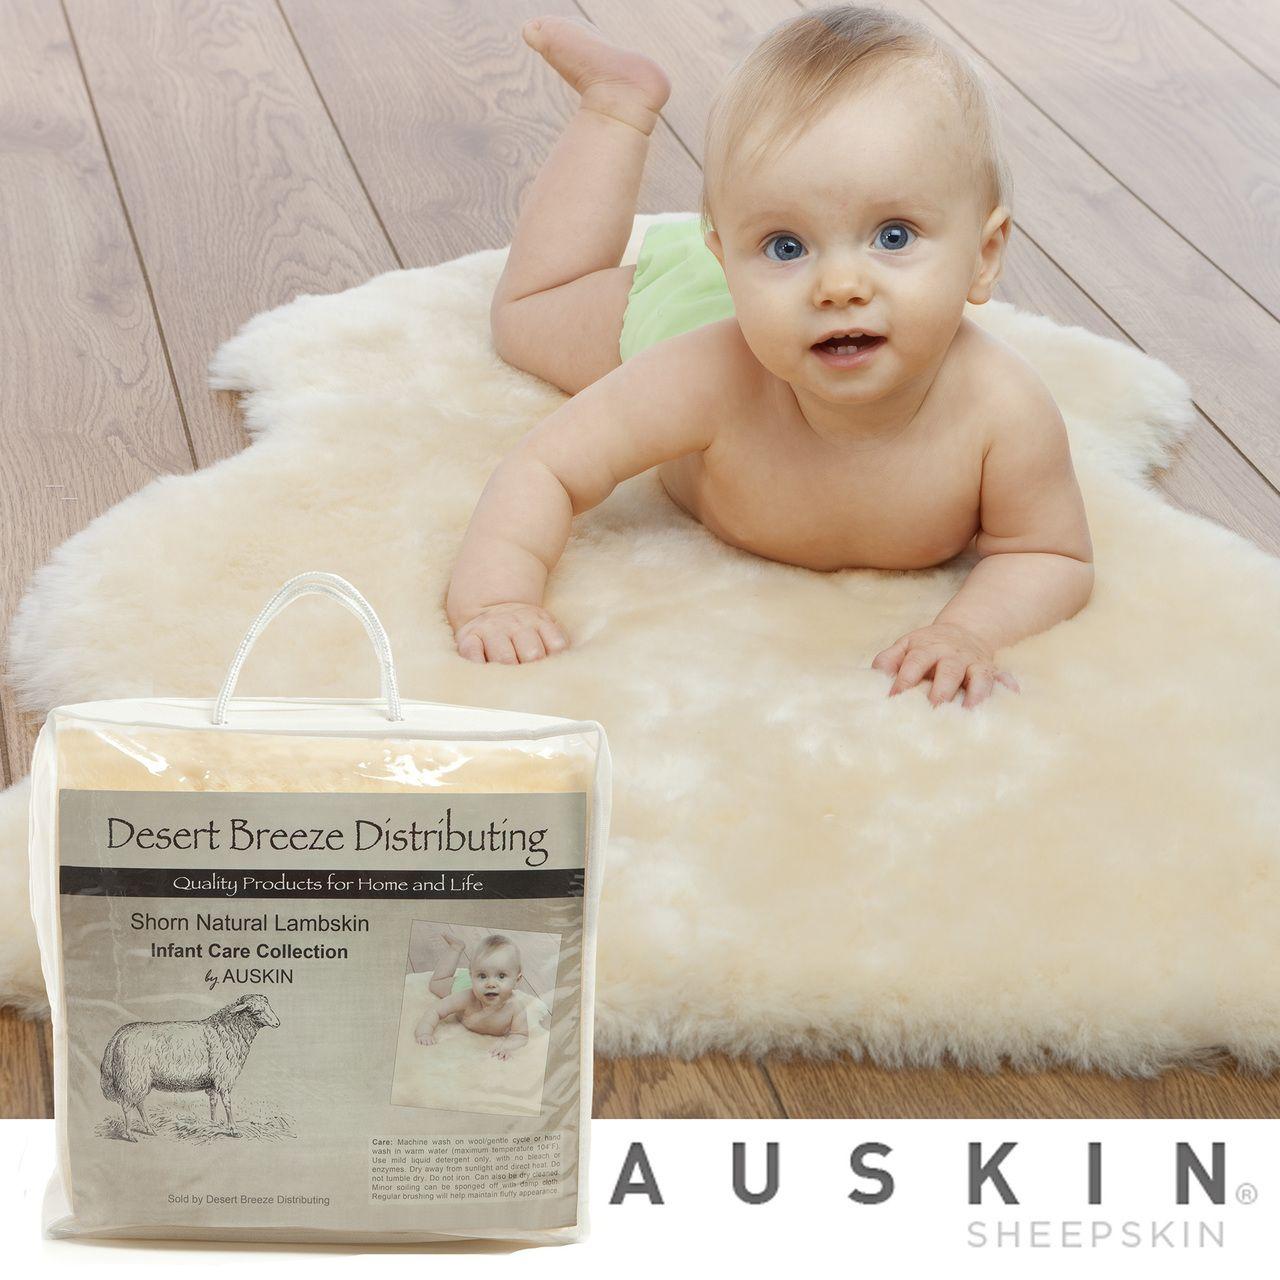 Lambskin Rug Auskin Care Natural Soothing Merino Sheepskin Baby Care Baby Rugs Lambskin